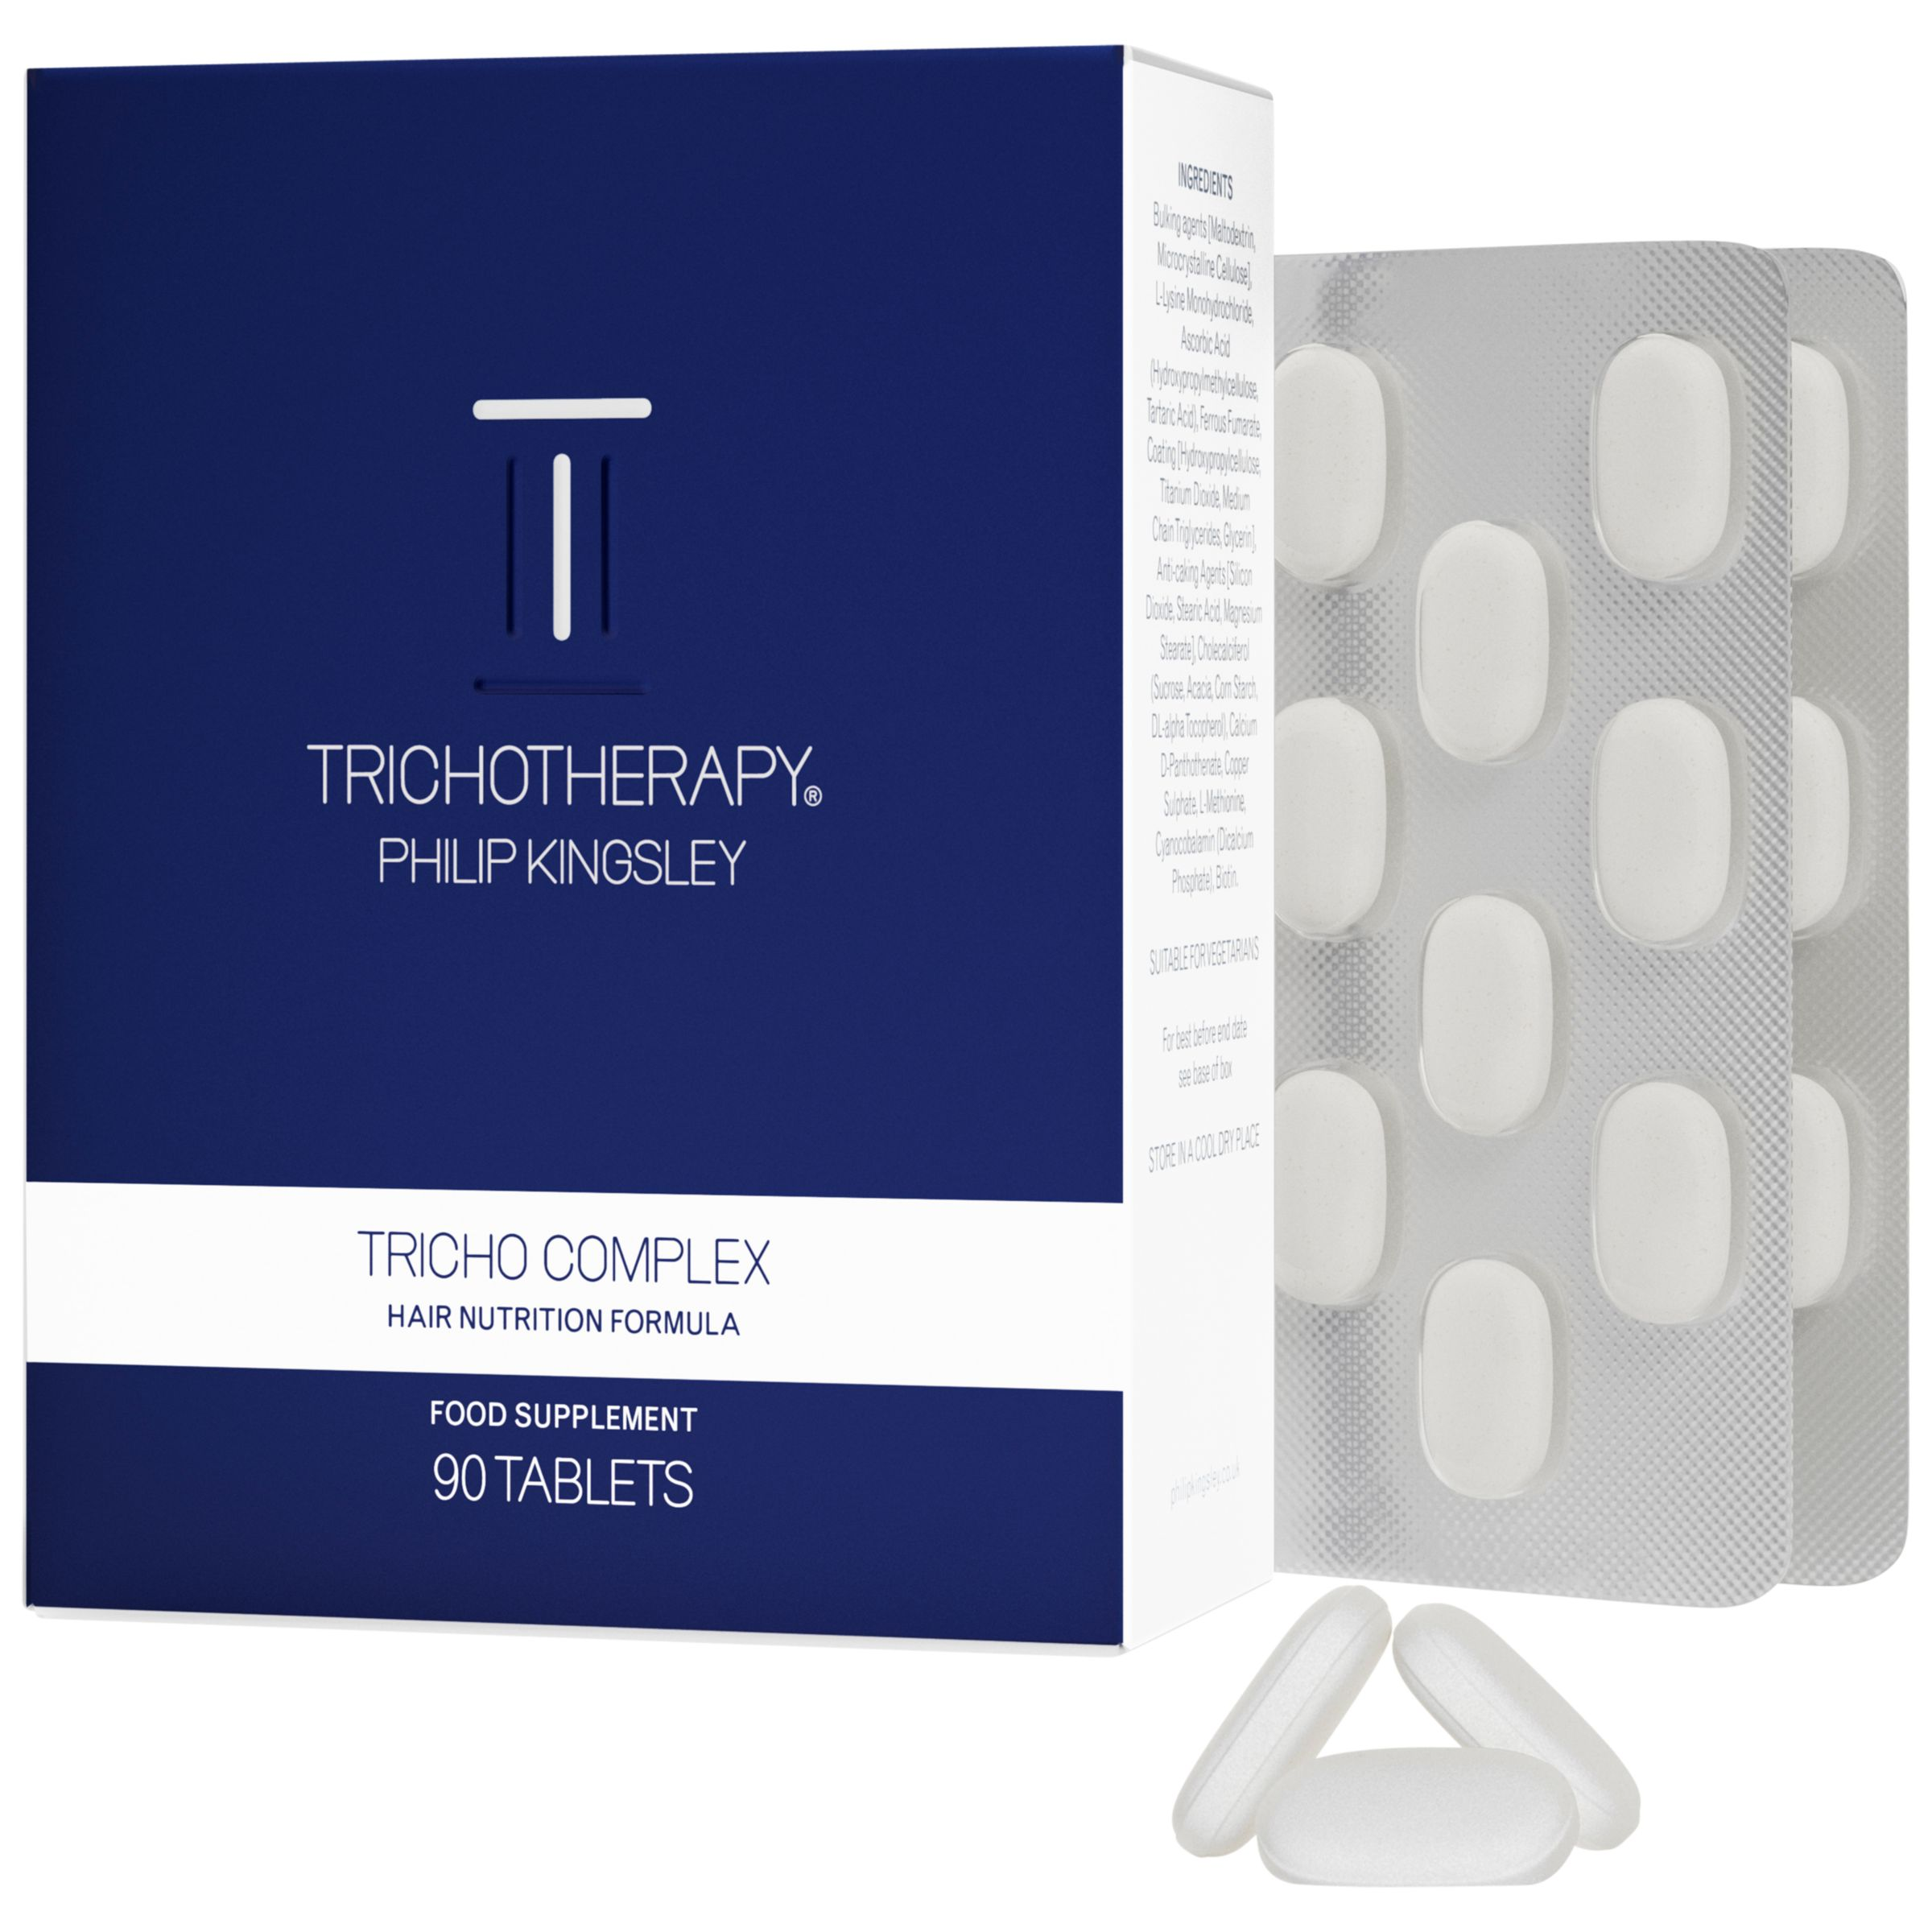 Philip Kingsley Philip Kingsley Tricho Complex, x 90 Tablets